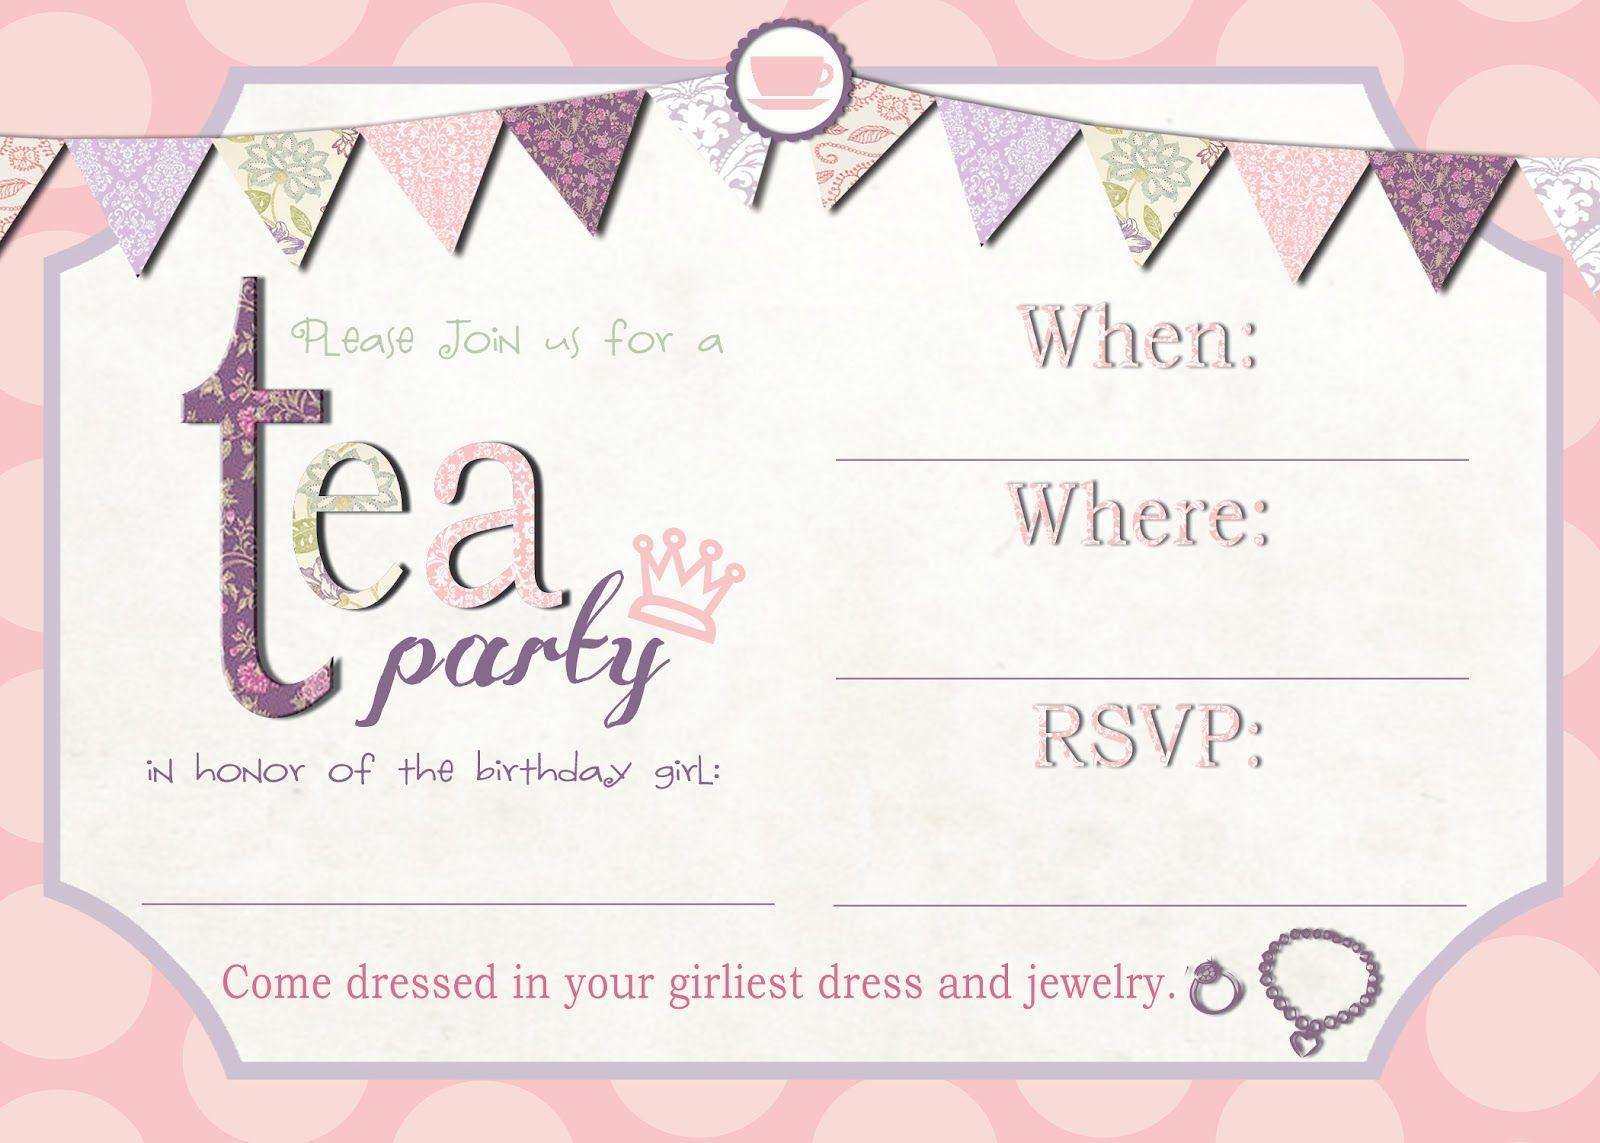 Tea Party Invitation Template Download – Invitetown | Girls' Tea - Free Printable Kitchen Tea Invitation Templates